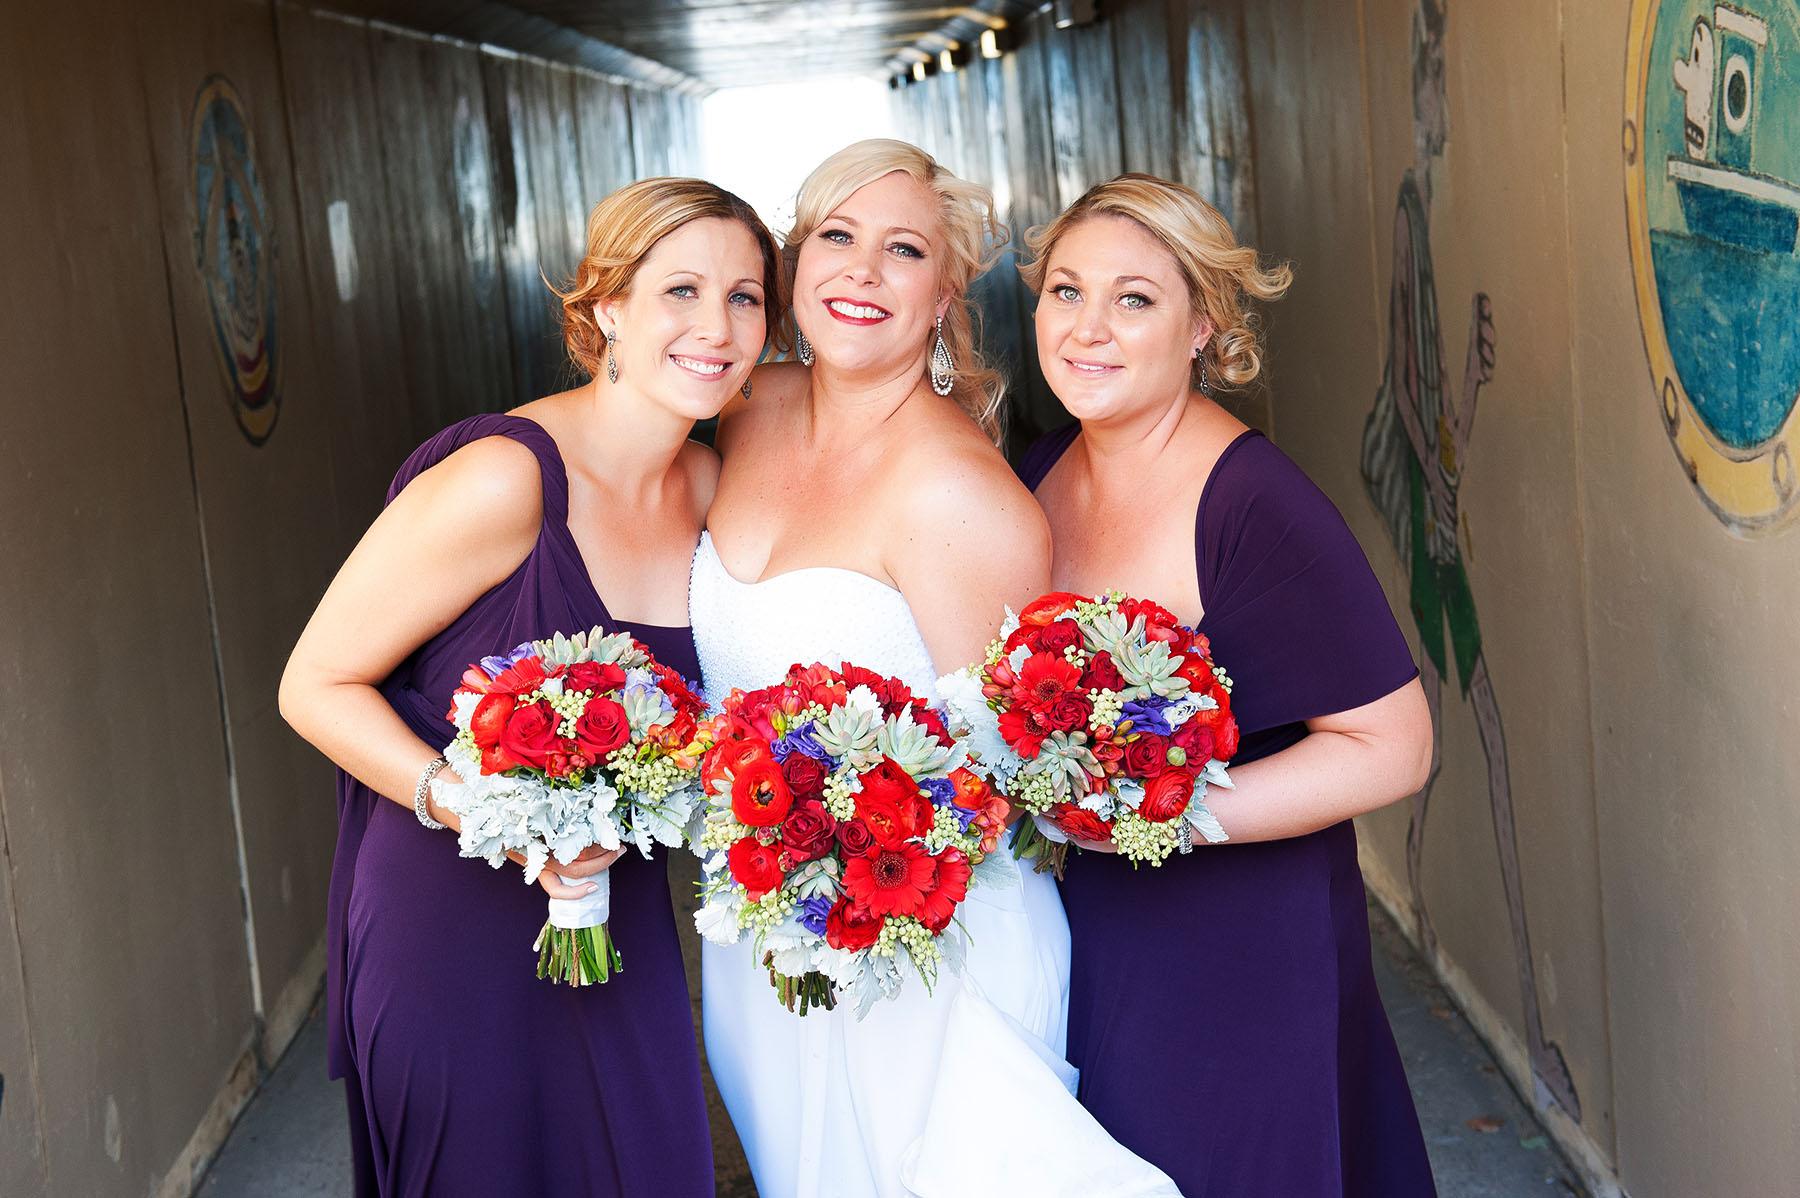 Marryme_wedding_photography_dorrigo_bellingen_photographer_59.jpg